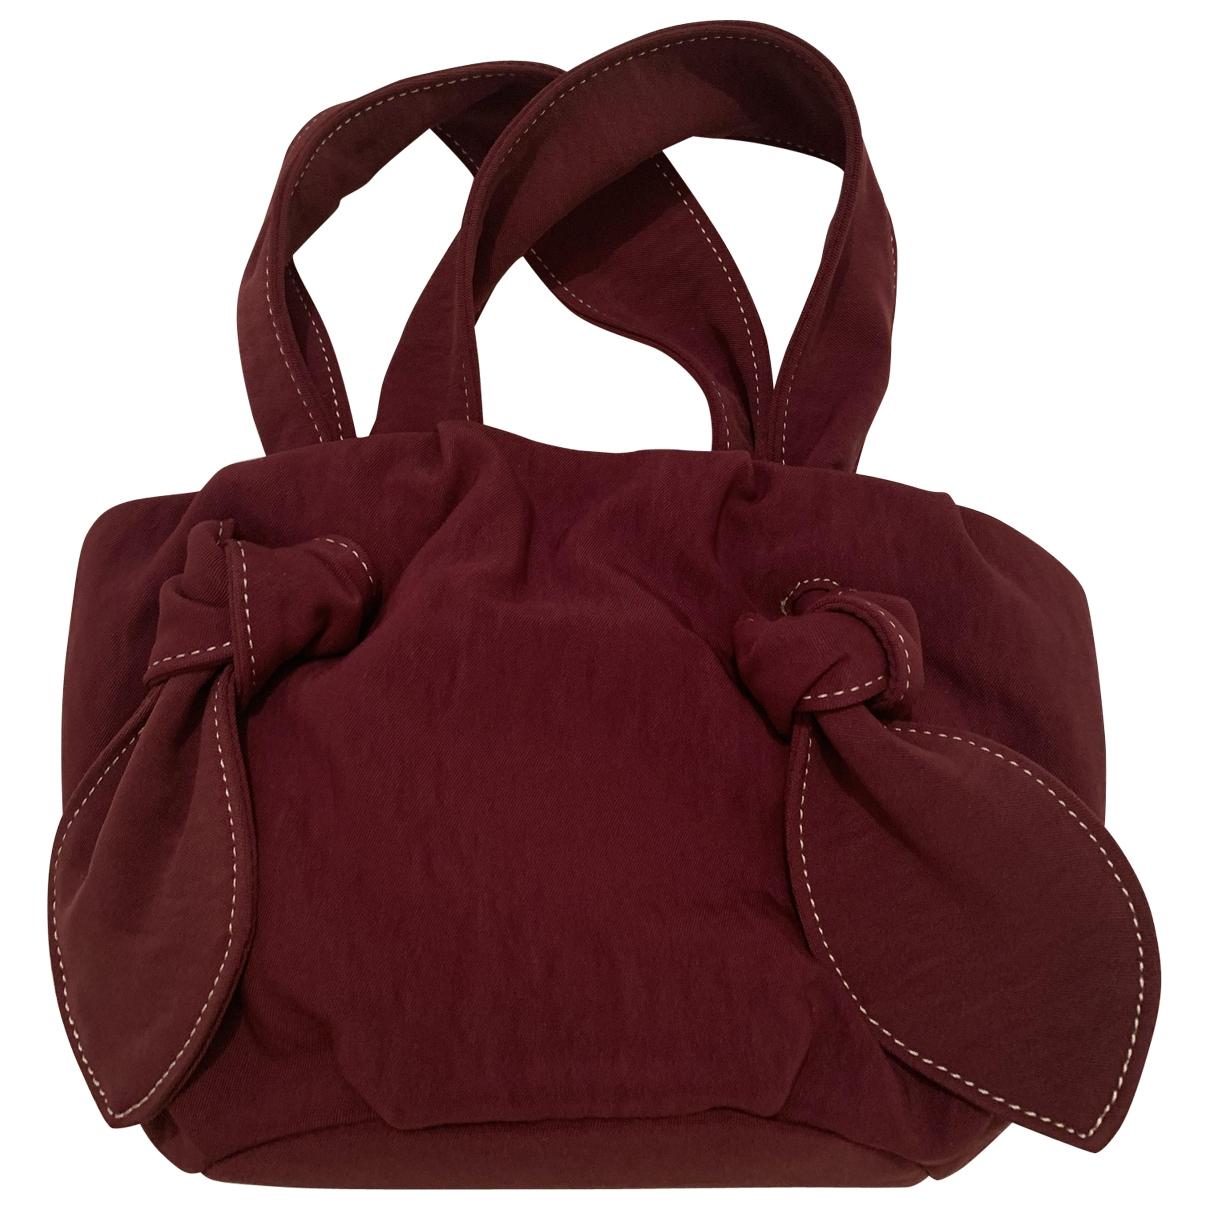 Staud \N Burgundy Cotton handbag for Women \N